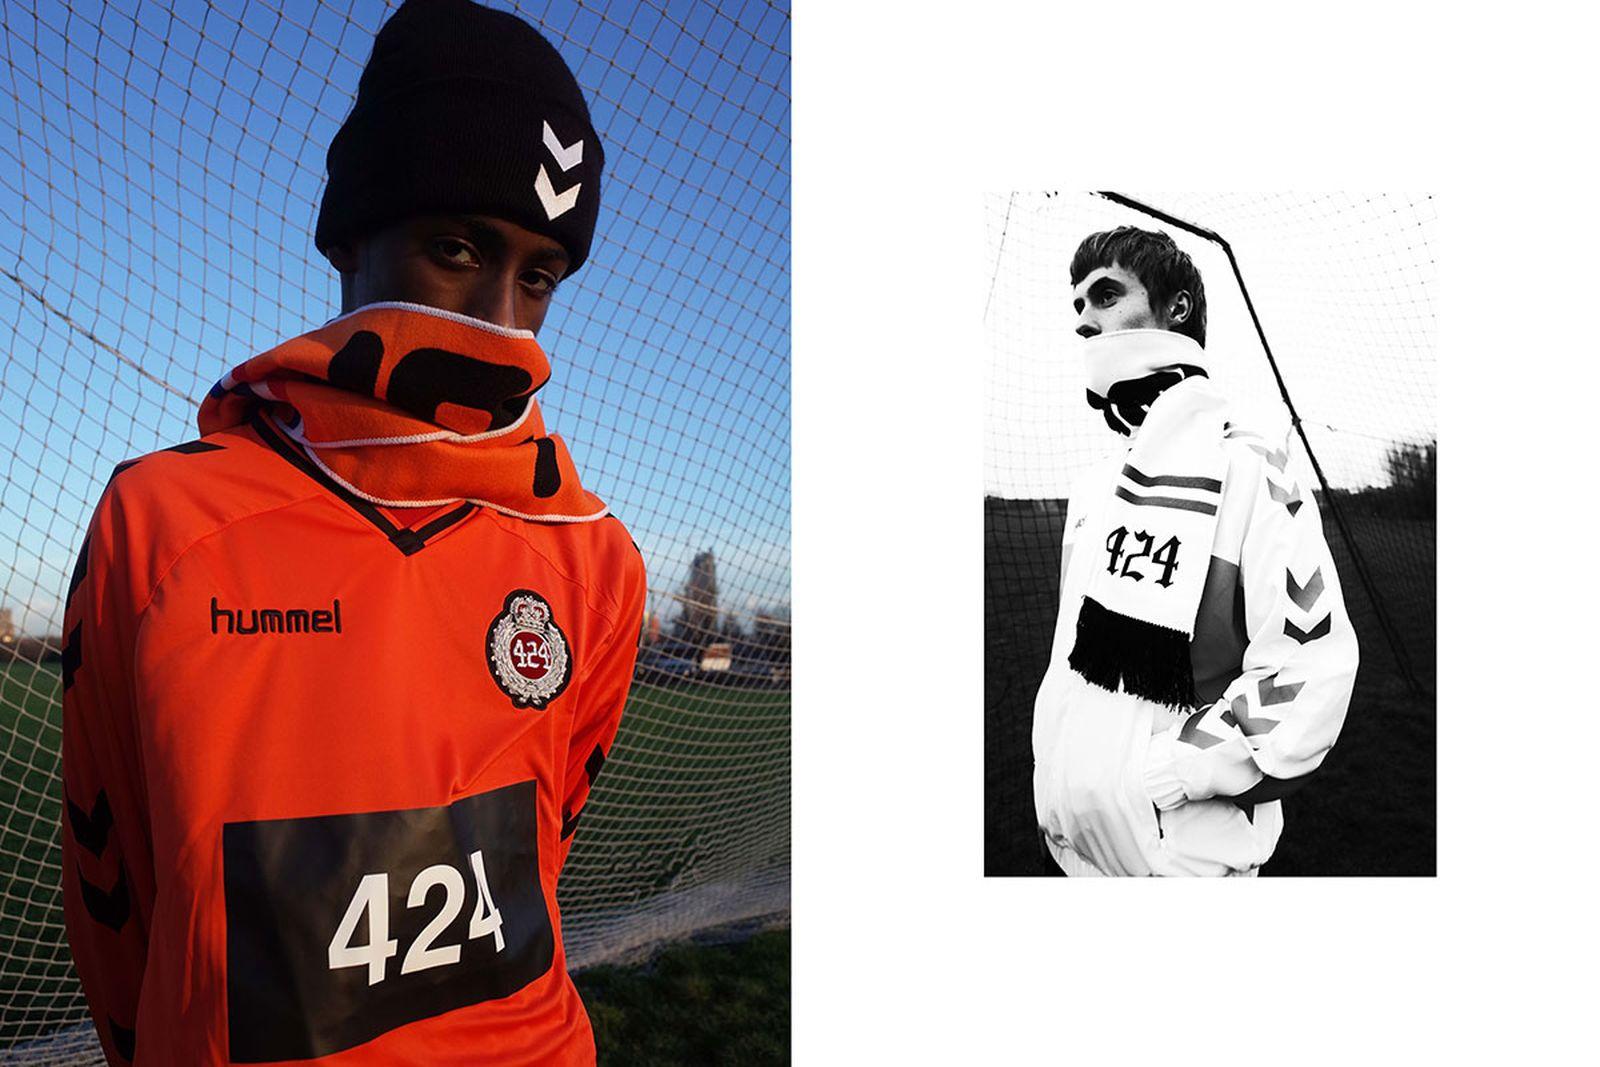 hummel-424-soccer-capsule-01